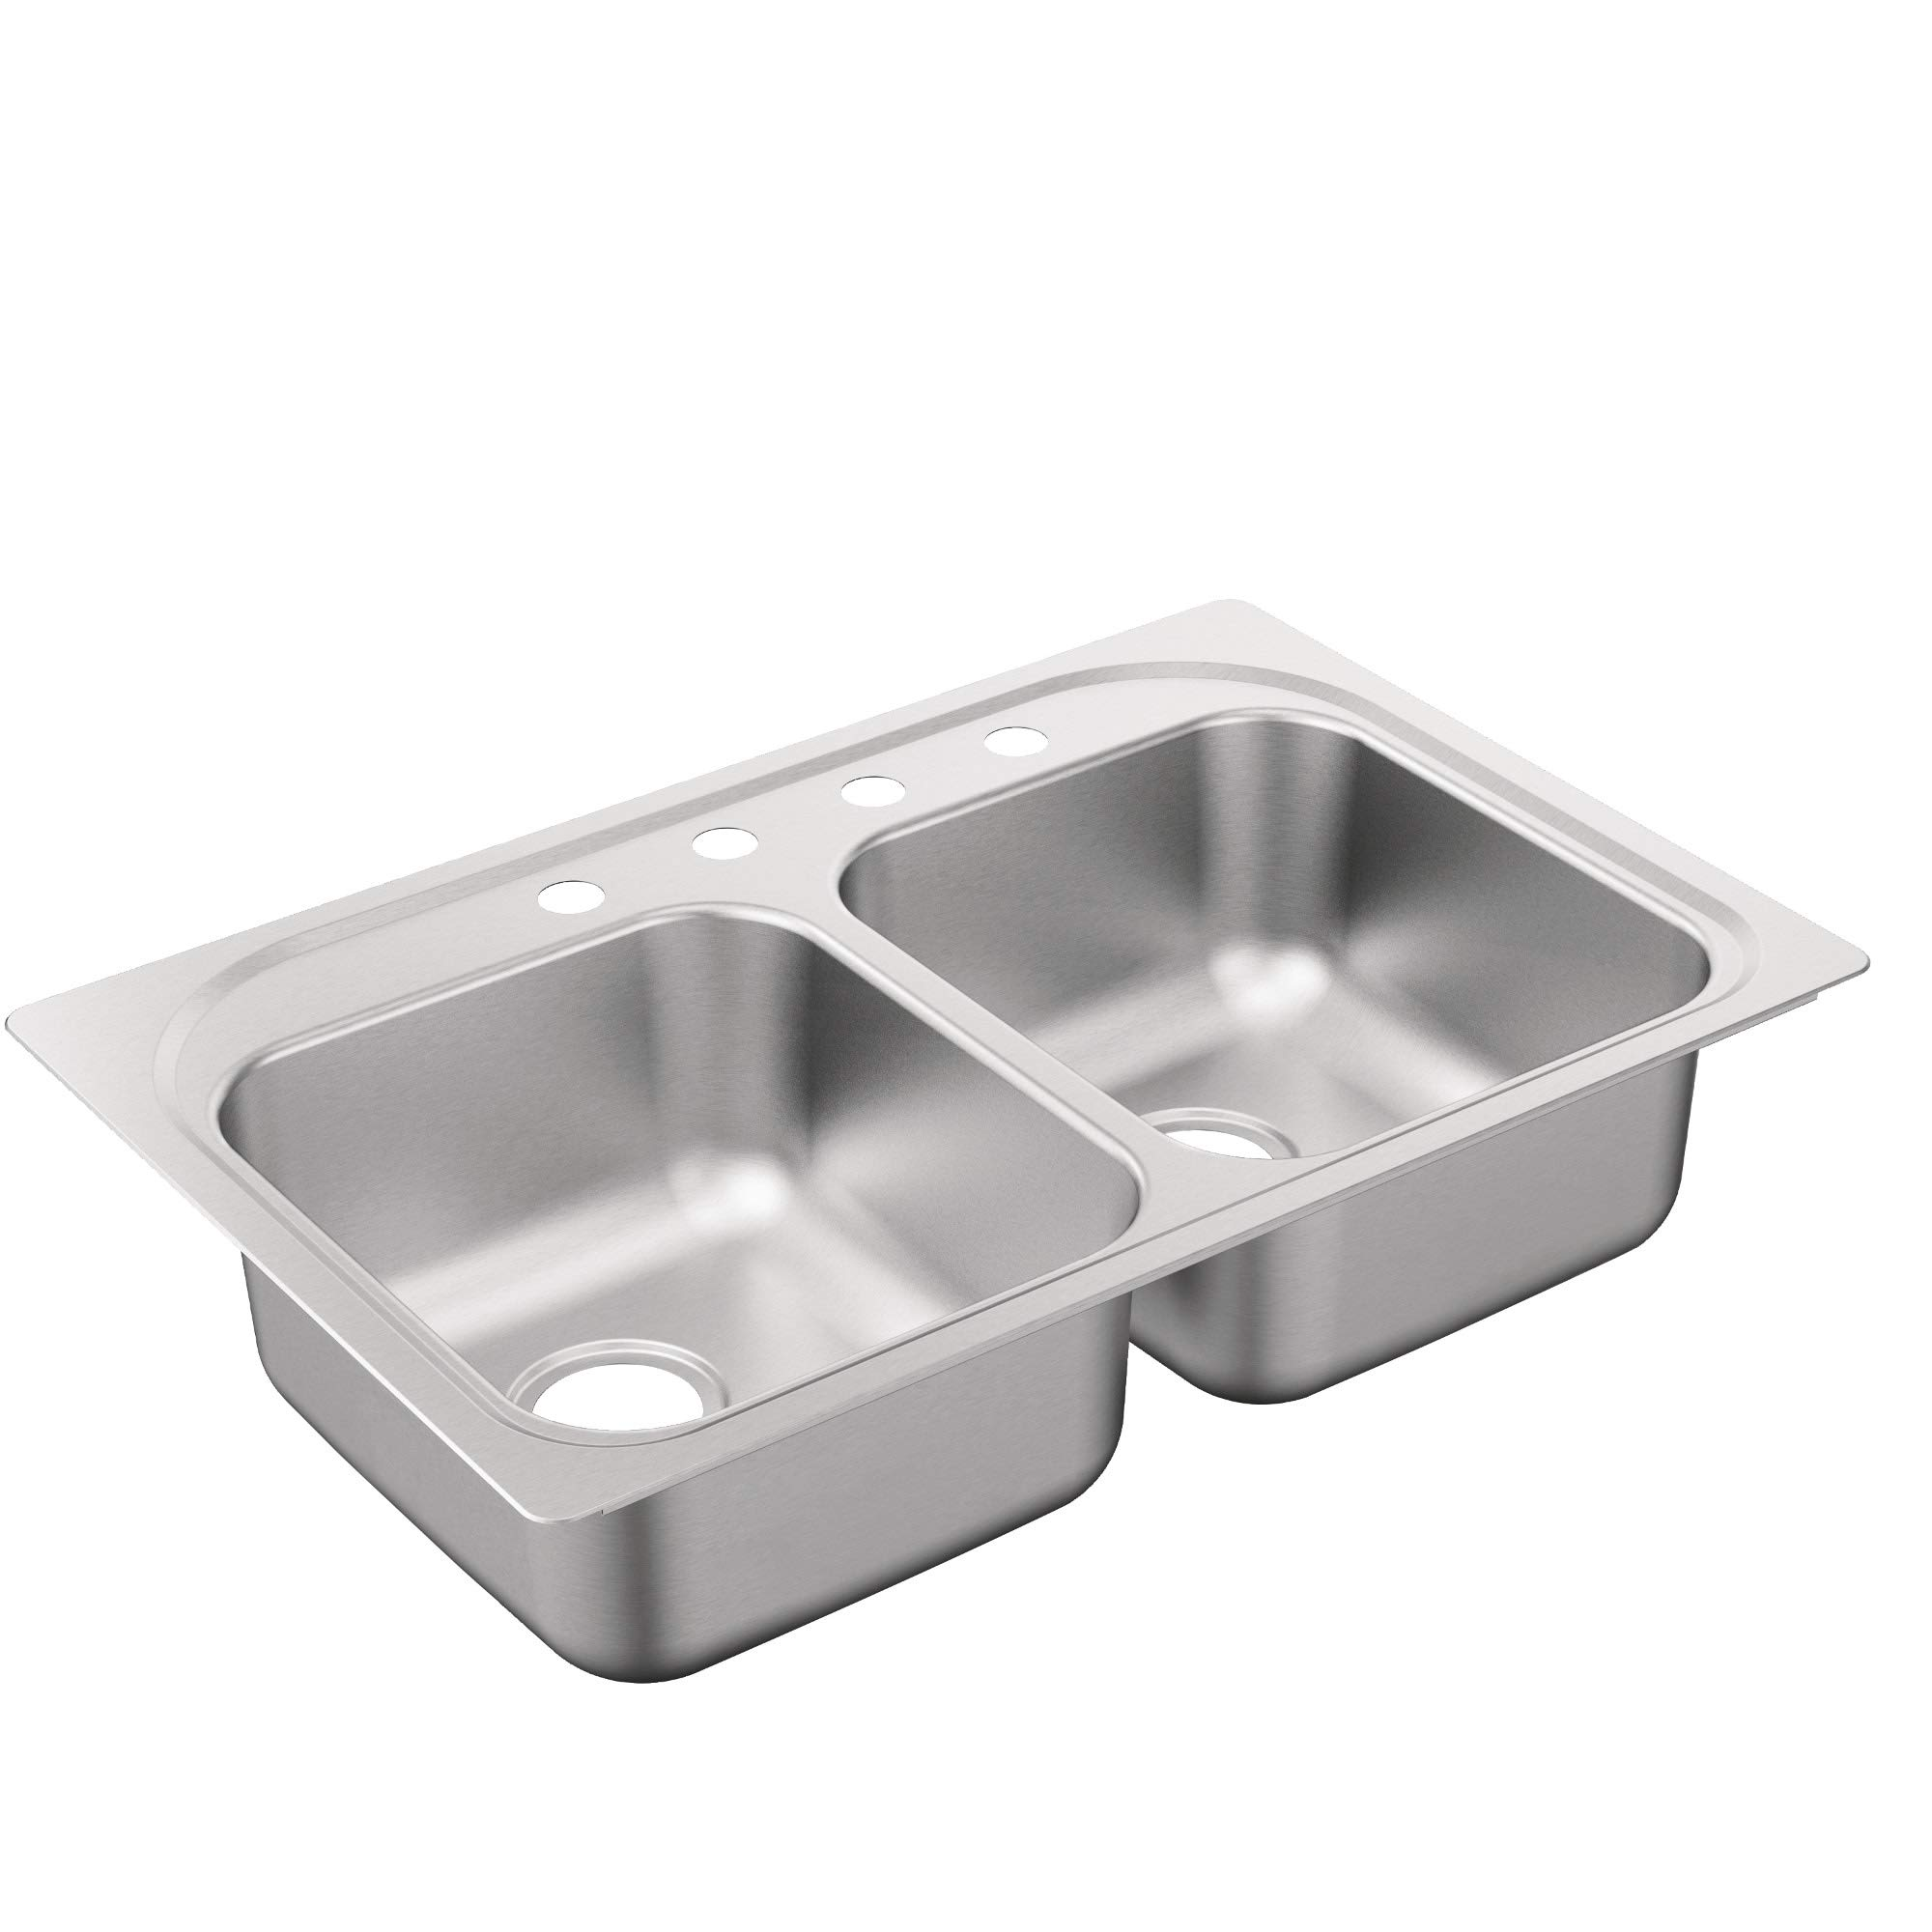 Moen G222134B 2200 Series Sink Brushed/Satin Stainless